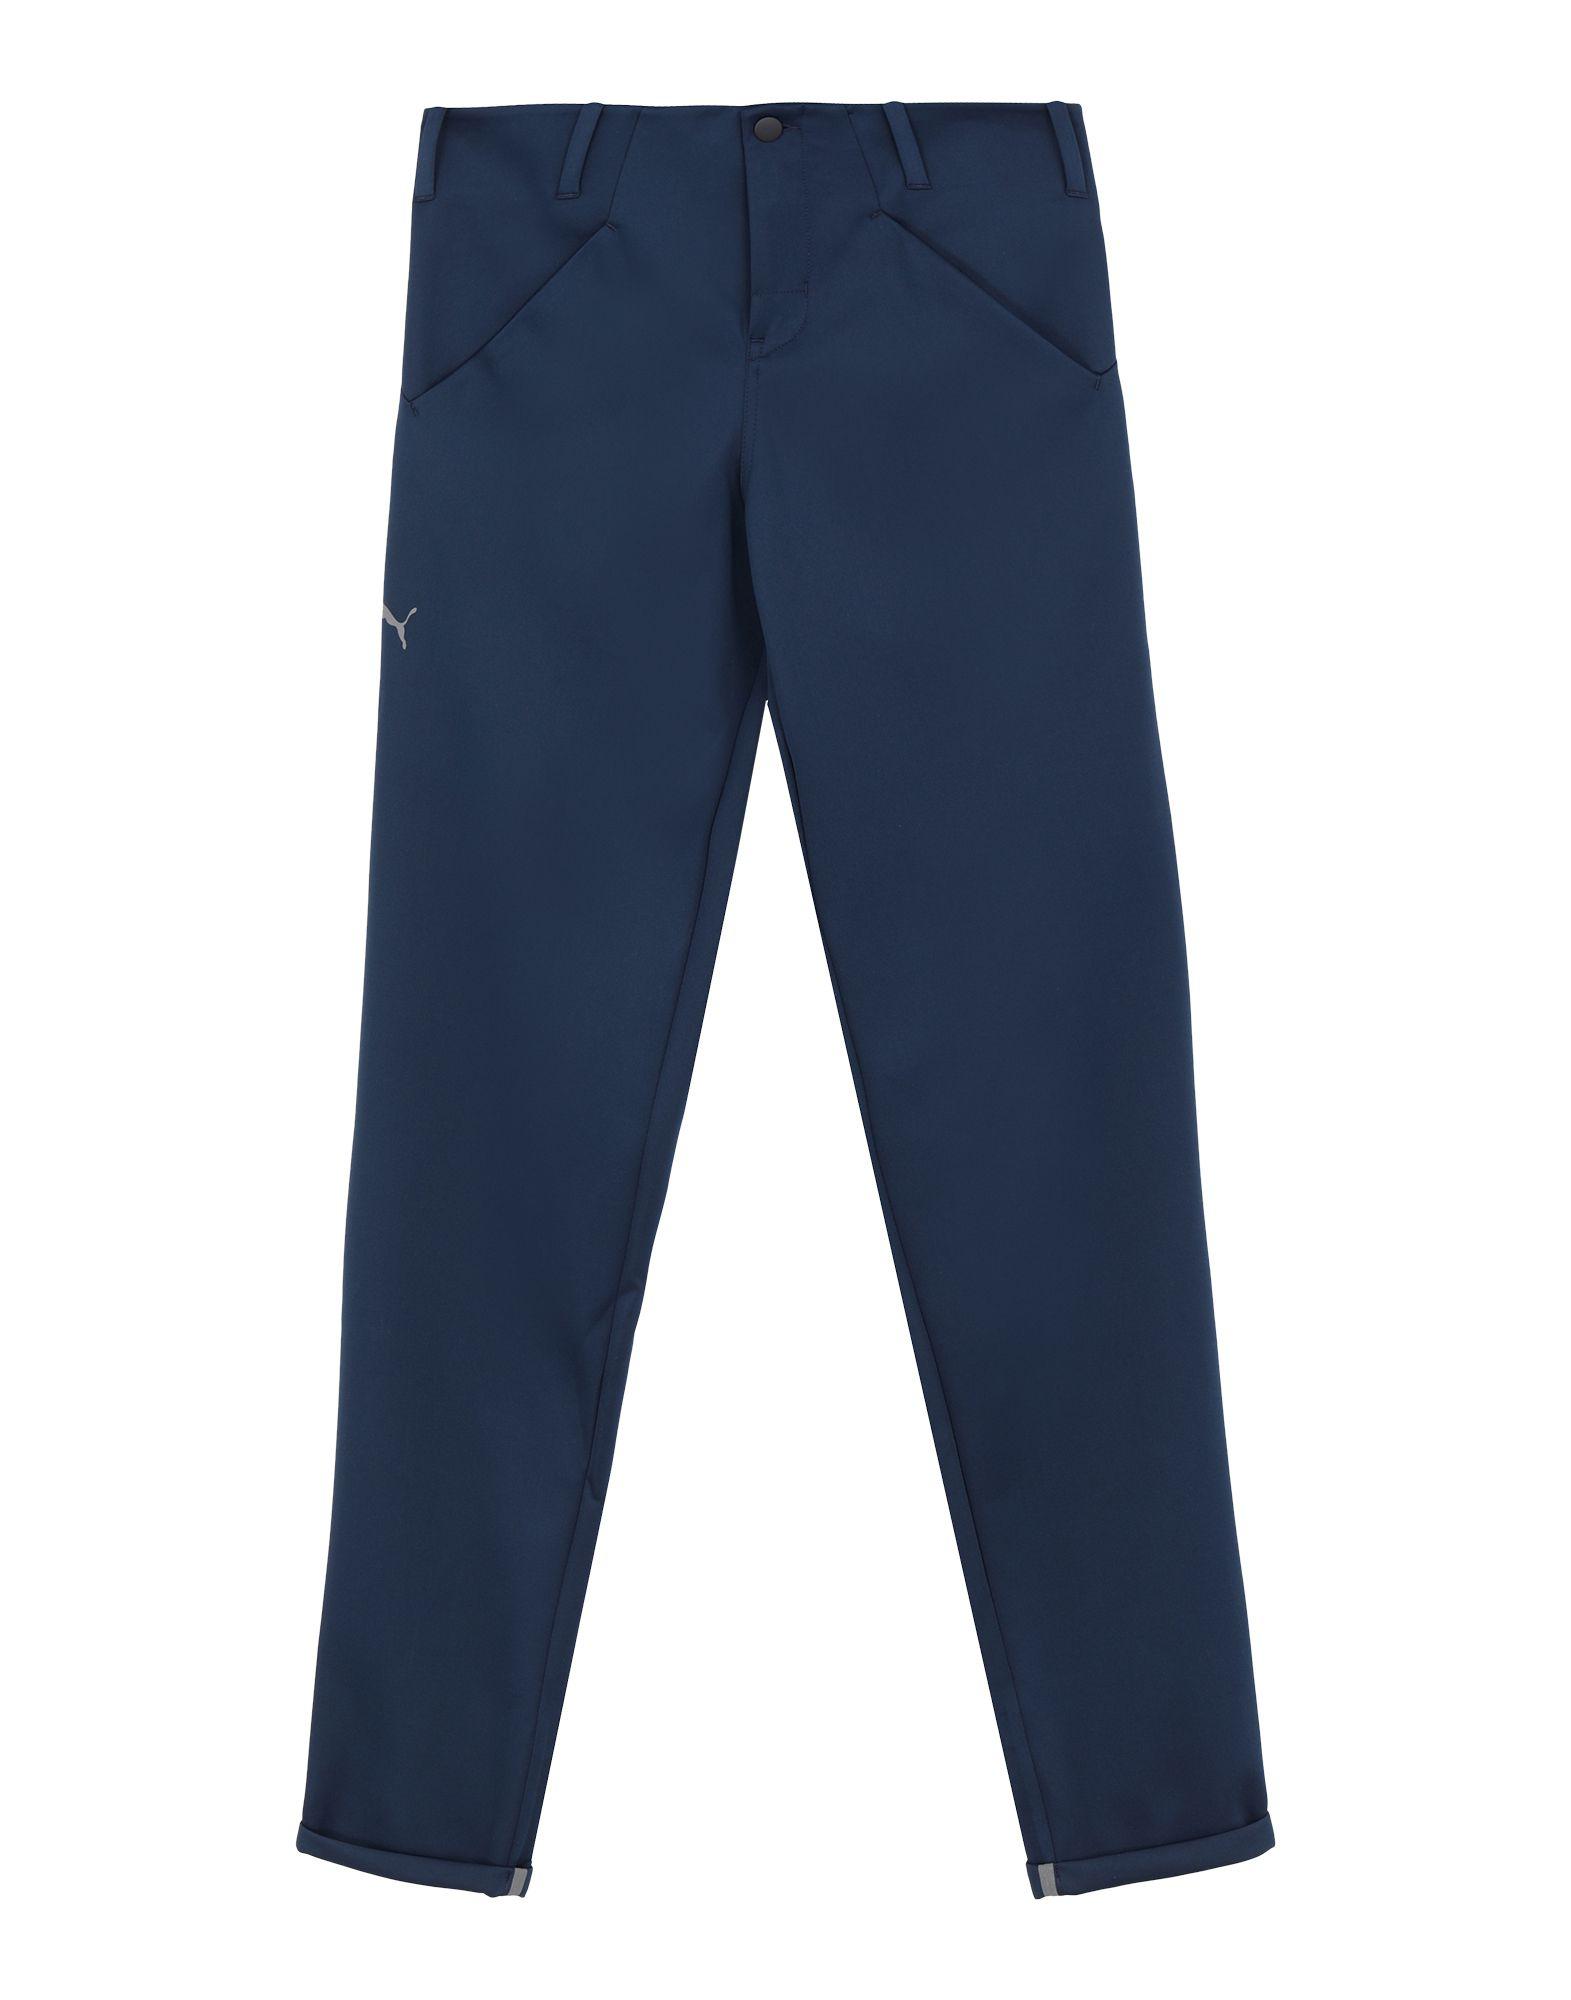 Фото - PUMA x PORSCHE DESIGN Повседневные брюки puma x porsche design футболка